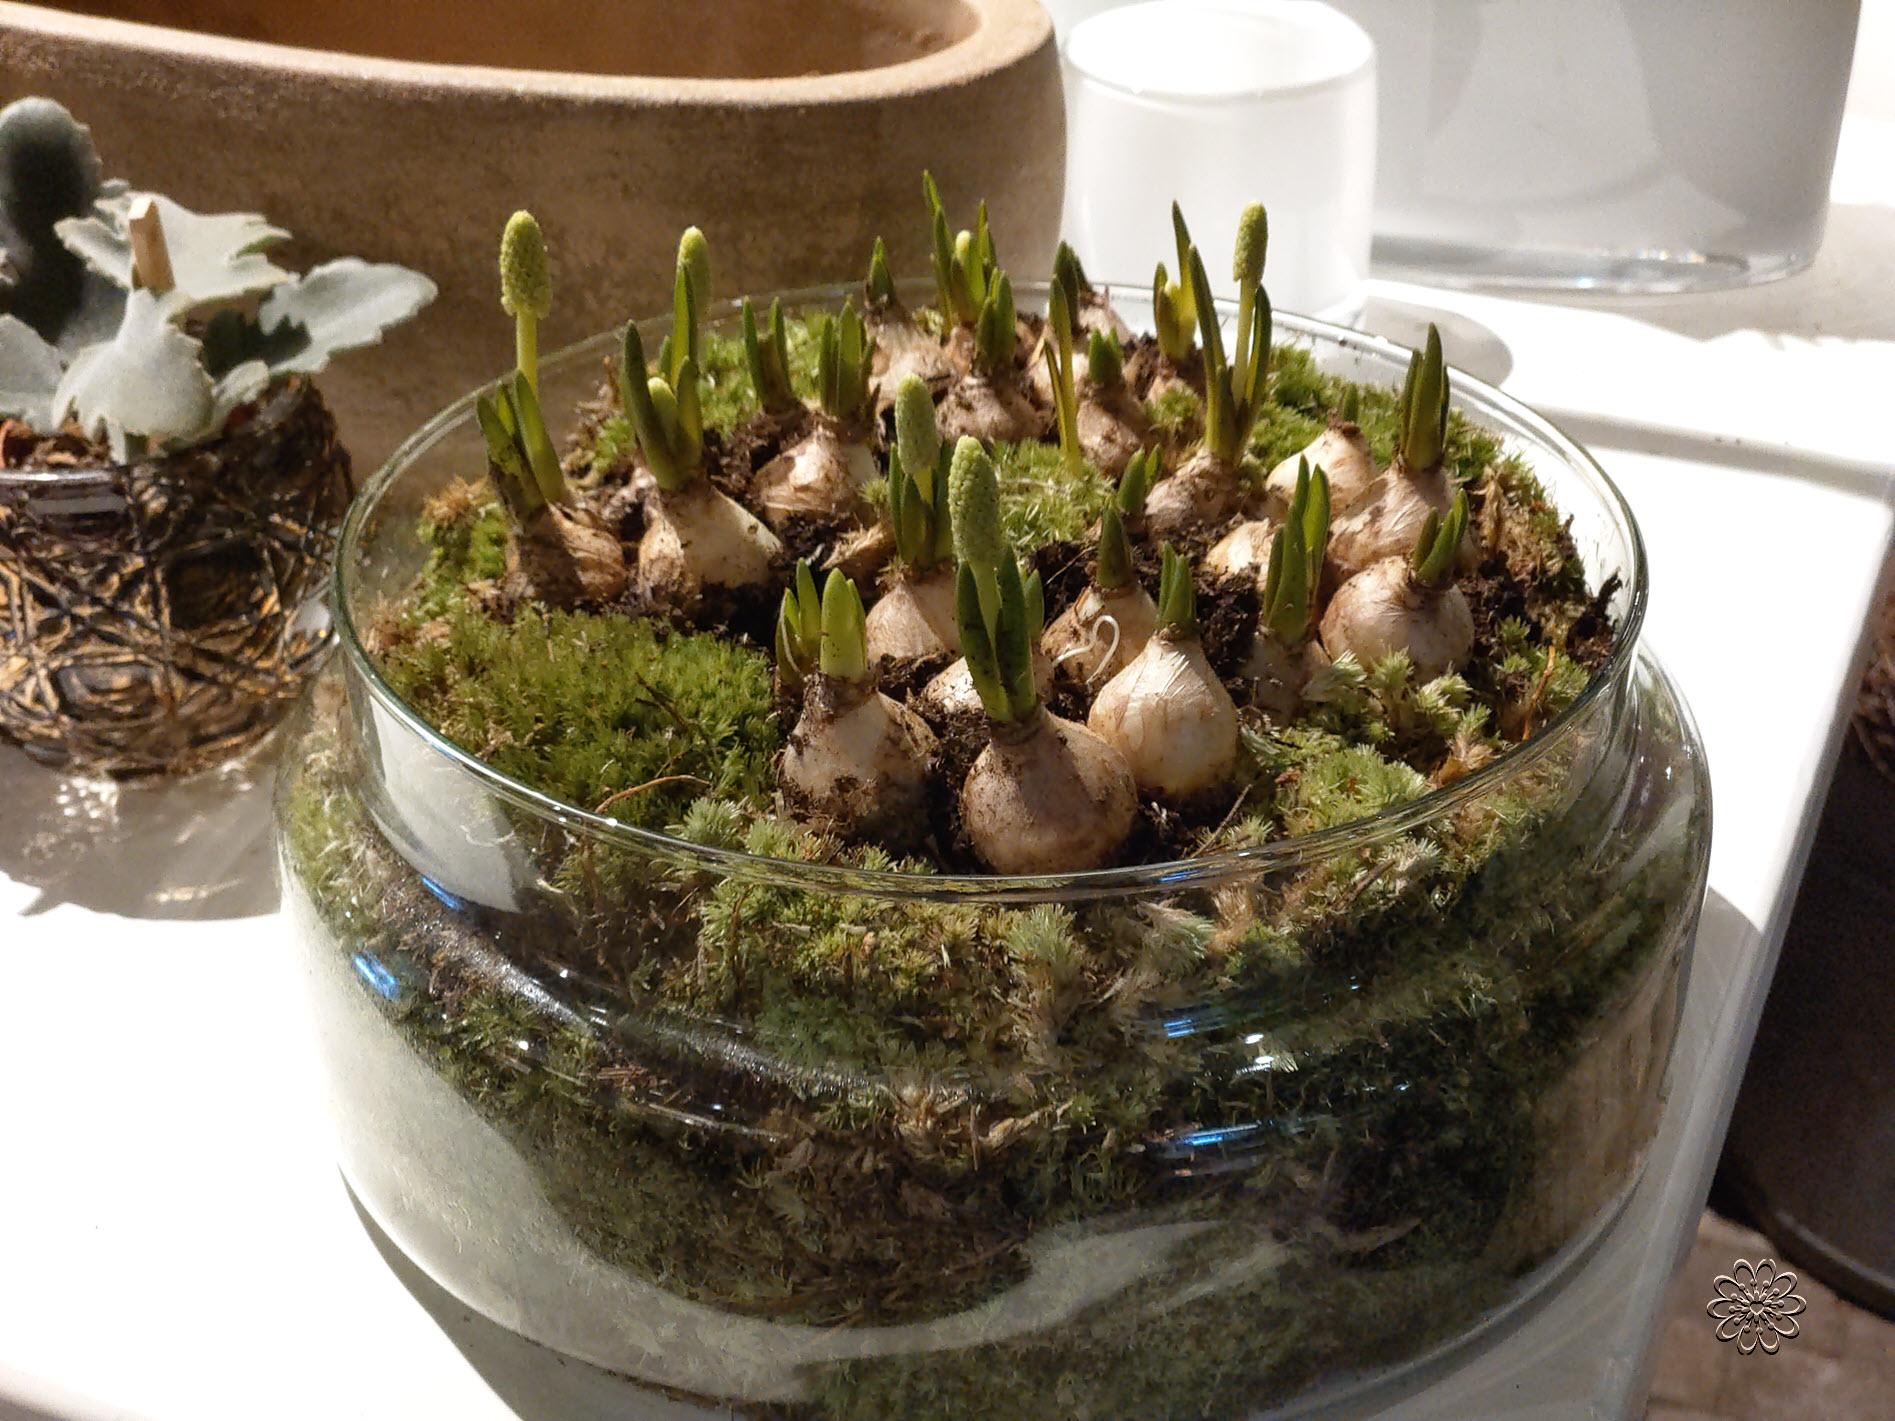 Bloemsierkunst-Groeneveld-kamerplanten-bollen-03